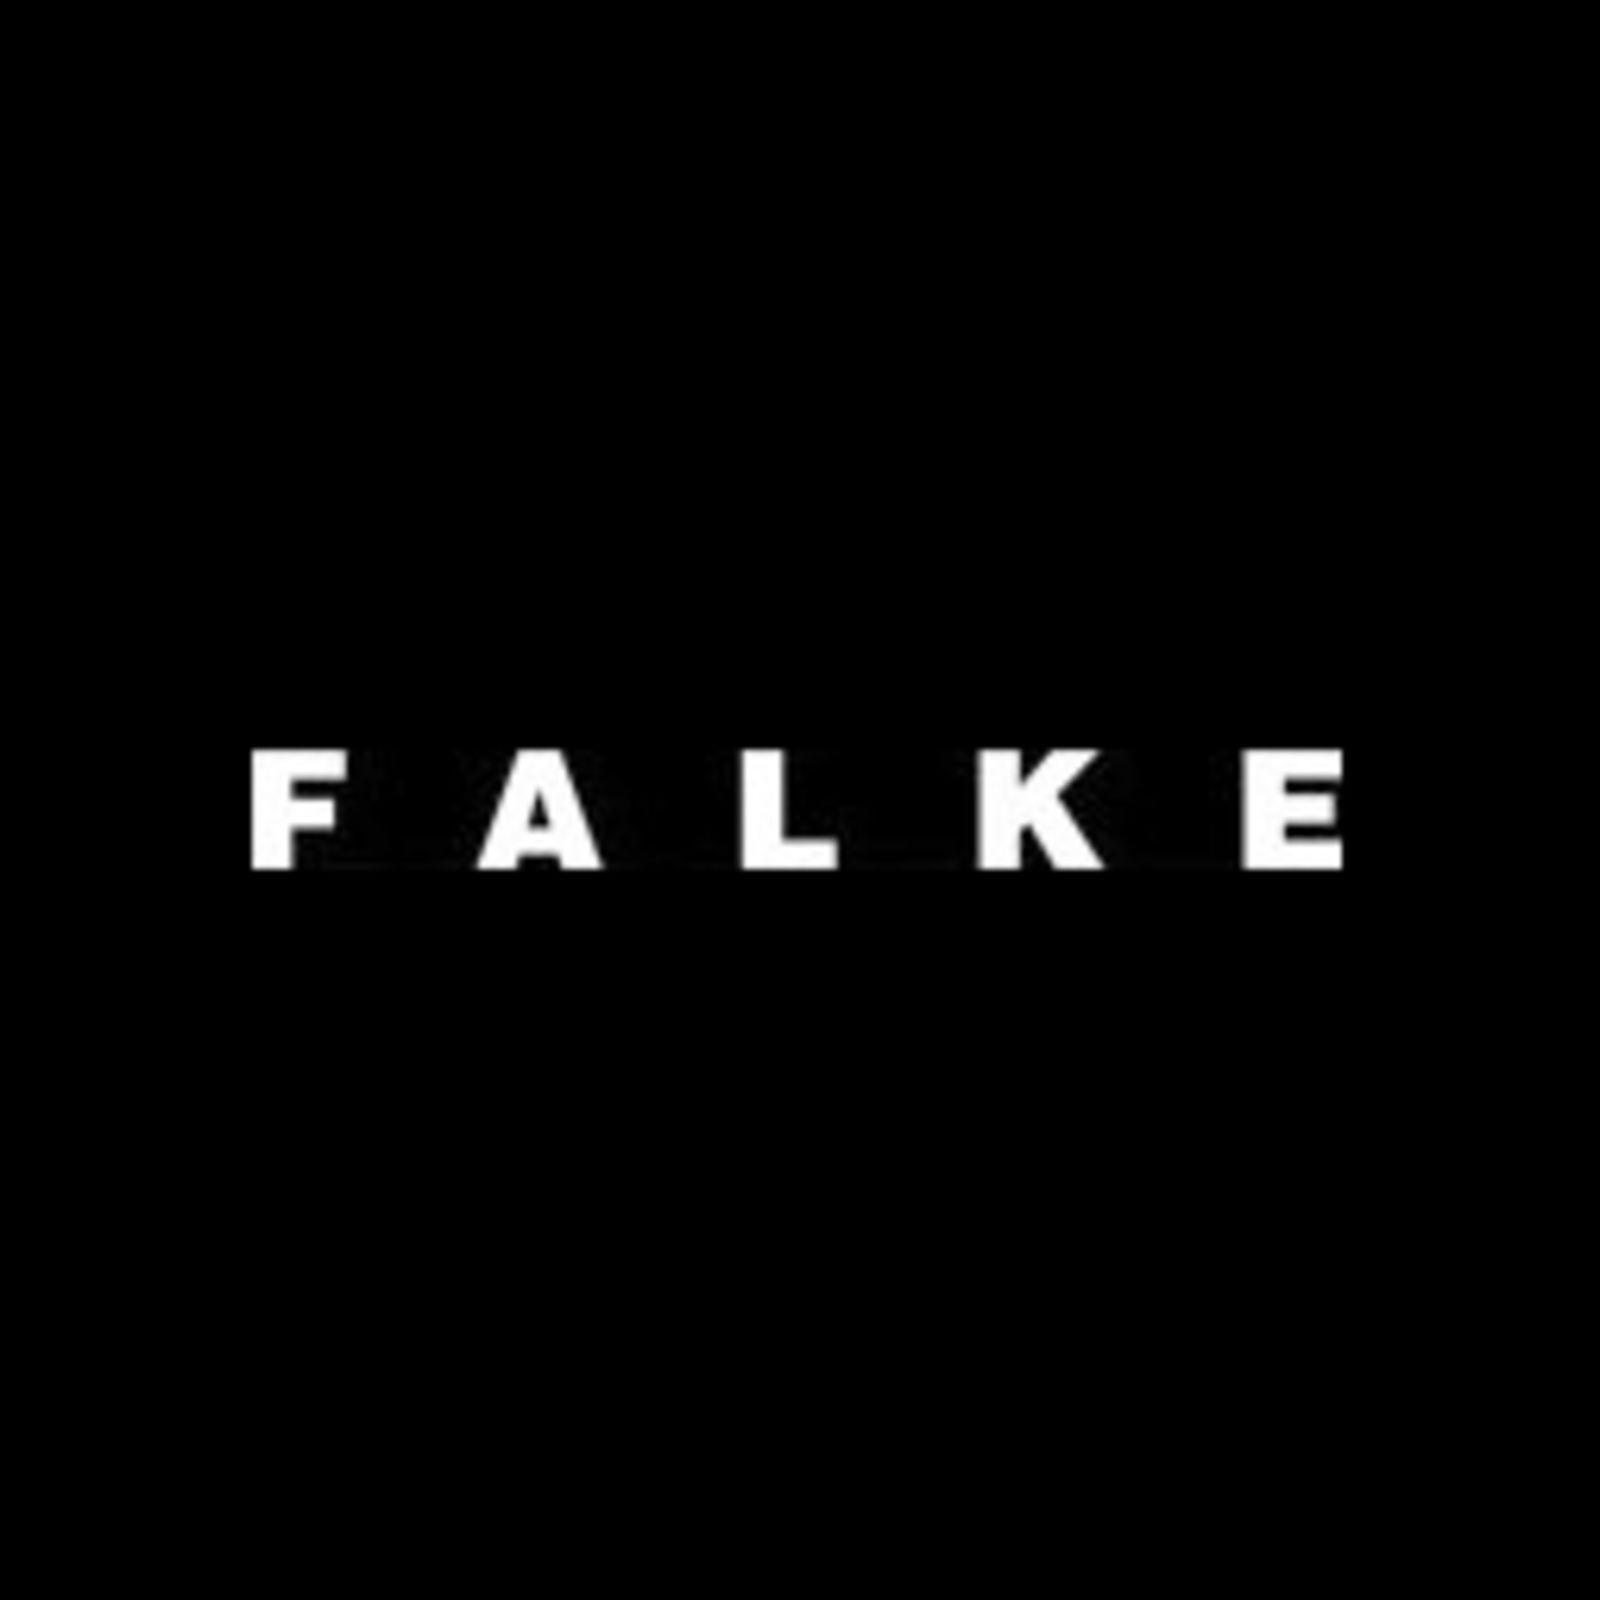 FALKE (Bild 1)